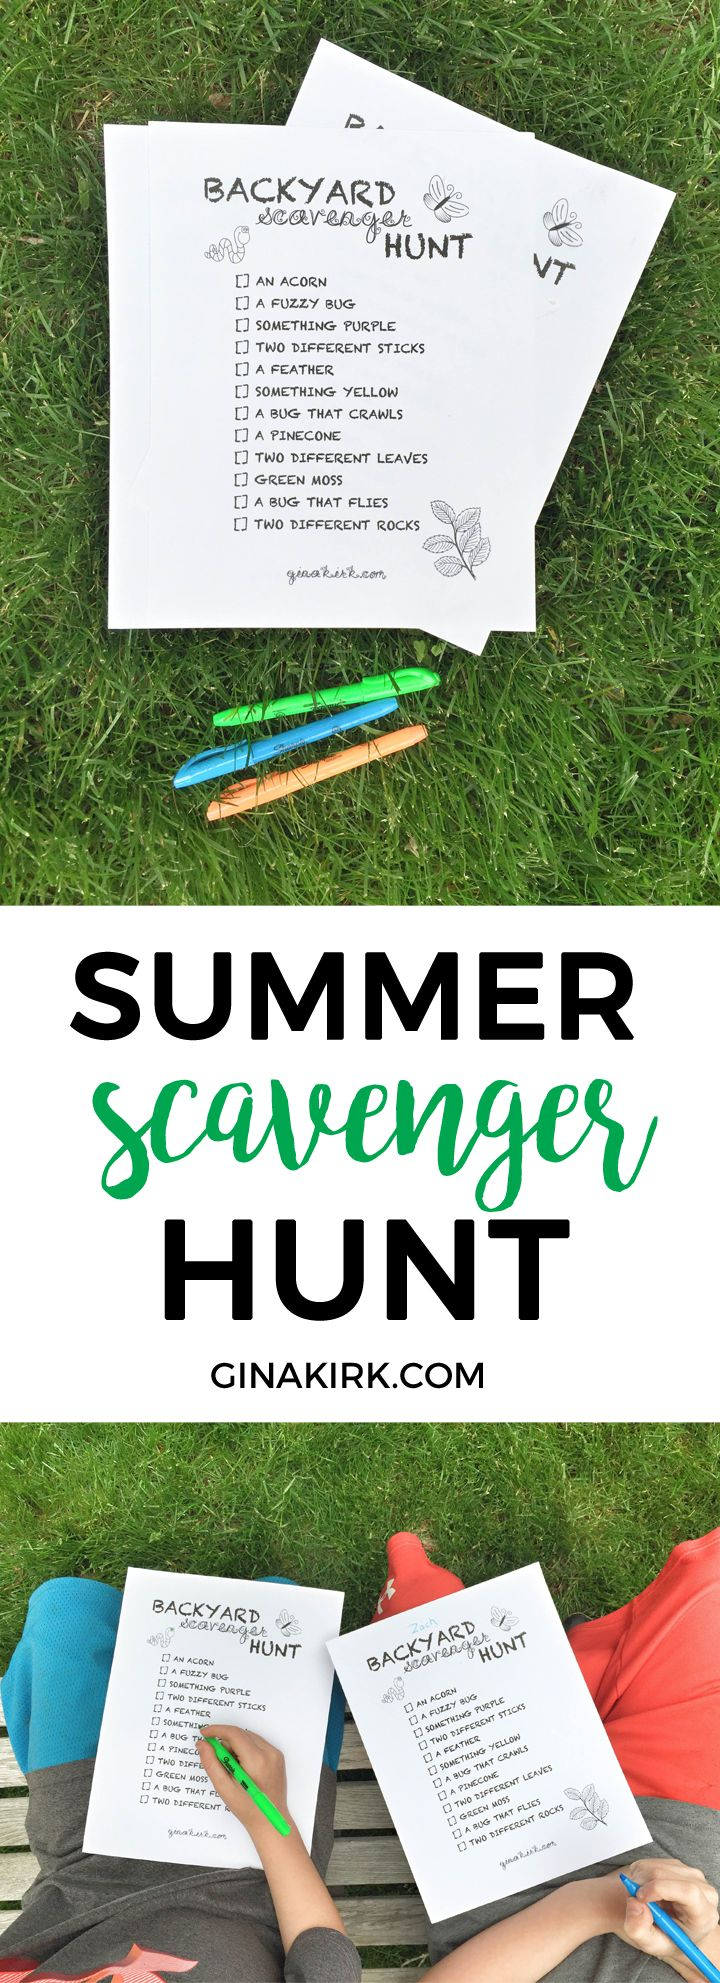 Backyard scavenger hunt | Printable summer nature scavenger hunt | Backyard ice cream party! | GinaKirk.com @ginaekirk #TopYourSummer #SoHoppinGood #ad